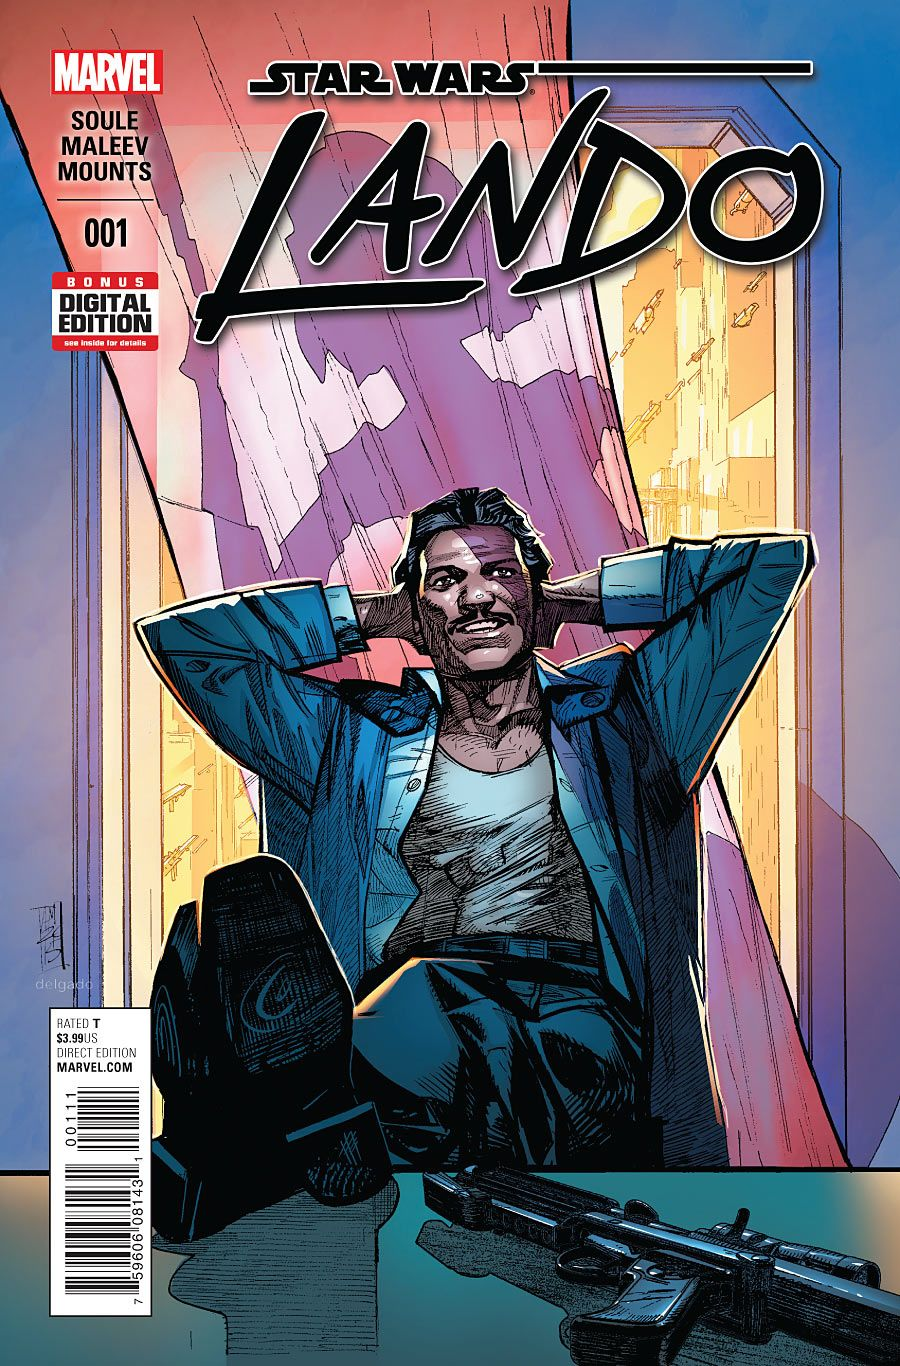 Star Wars: Lando #1 September 2015 https://www.facebook.com/pages/The-Nerd-Rave/113442648801172 #thenerdrave #marvel #comics #lando #starwars